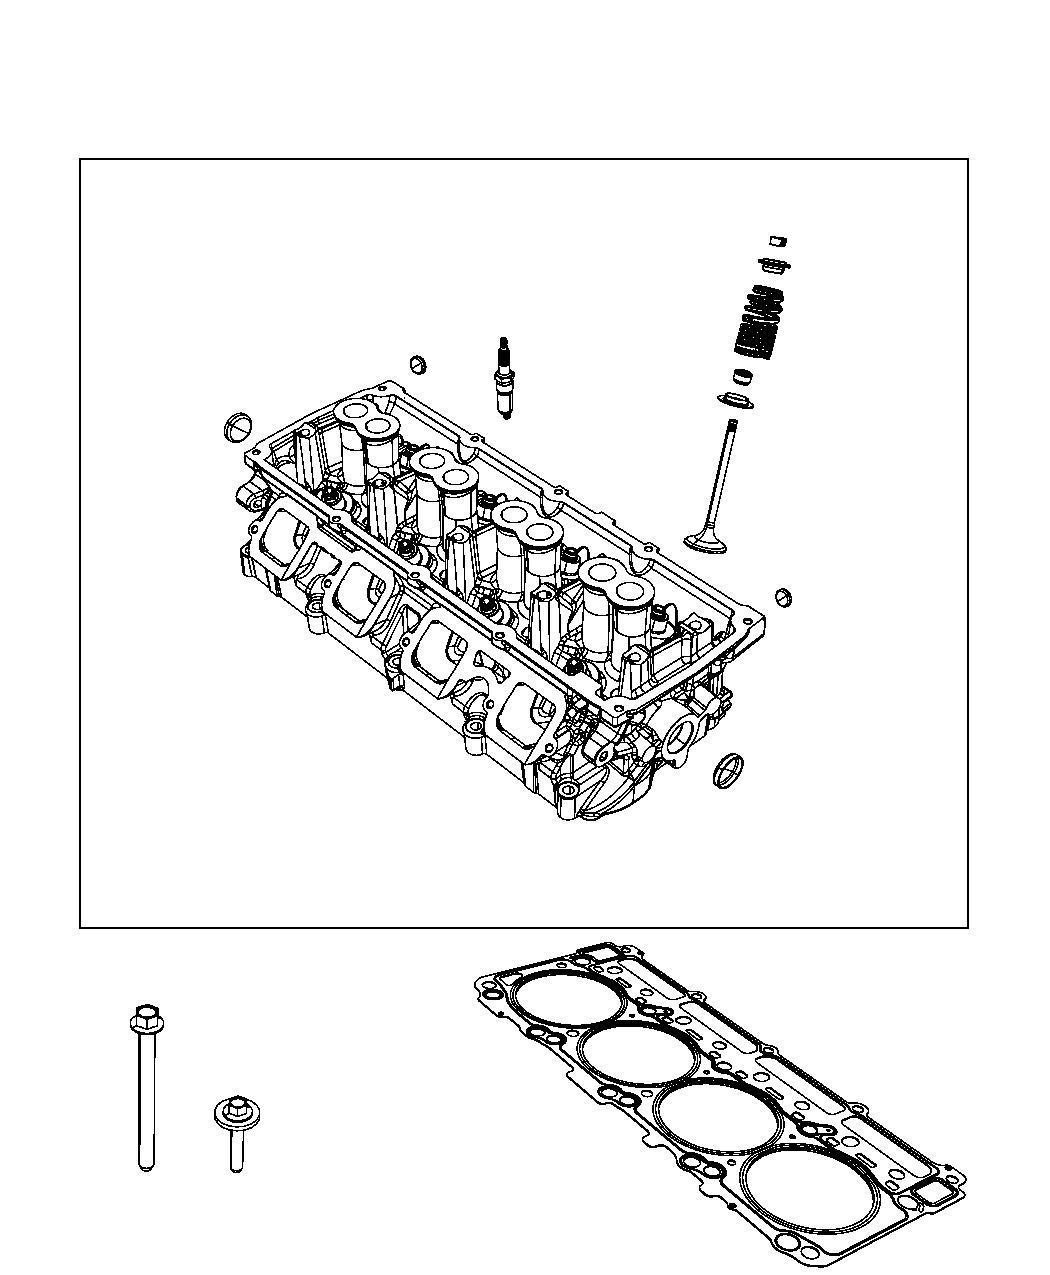 Jeep Grand Cherokee Spark Plug Left Left Cylinder Head